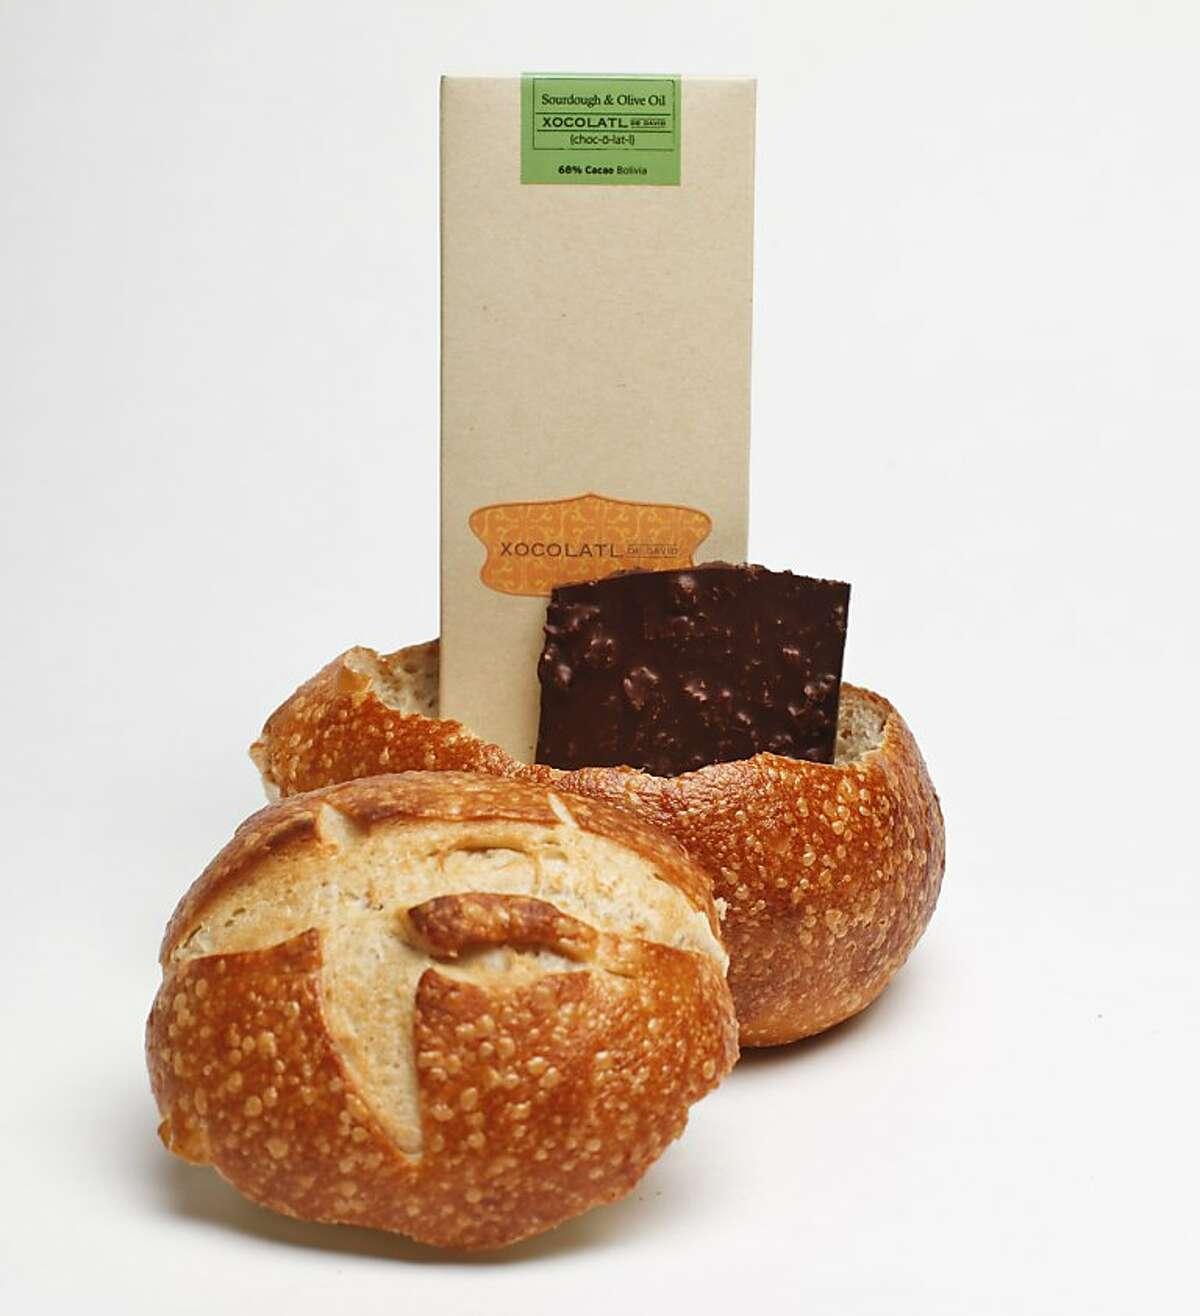 A Boudin bread bowl and Xocolatl de David chocolate are seen on Monday, Nov. 5, 2012 in San Francisco, Calif.